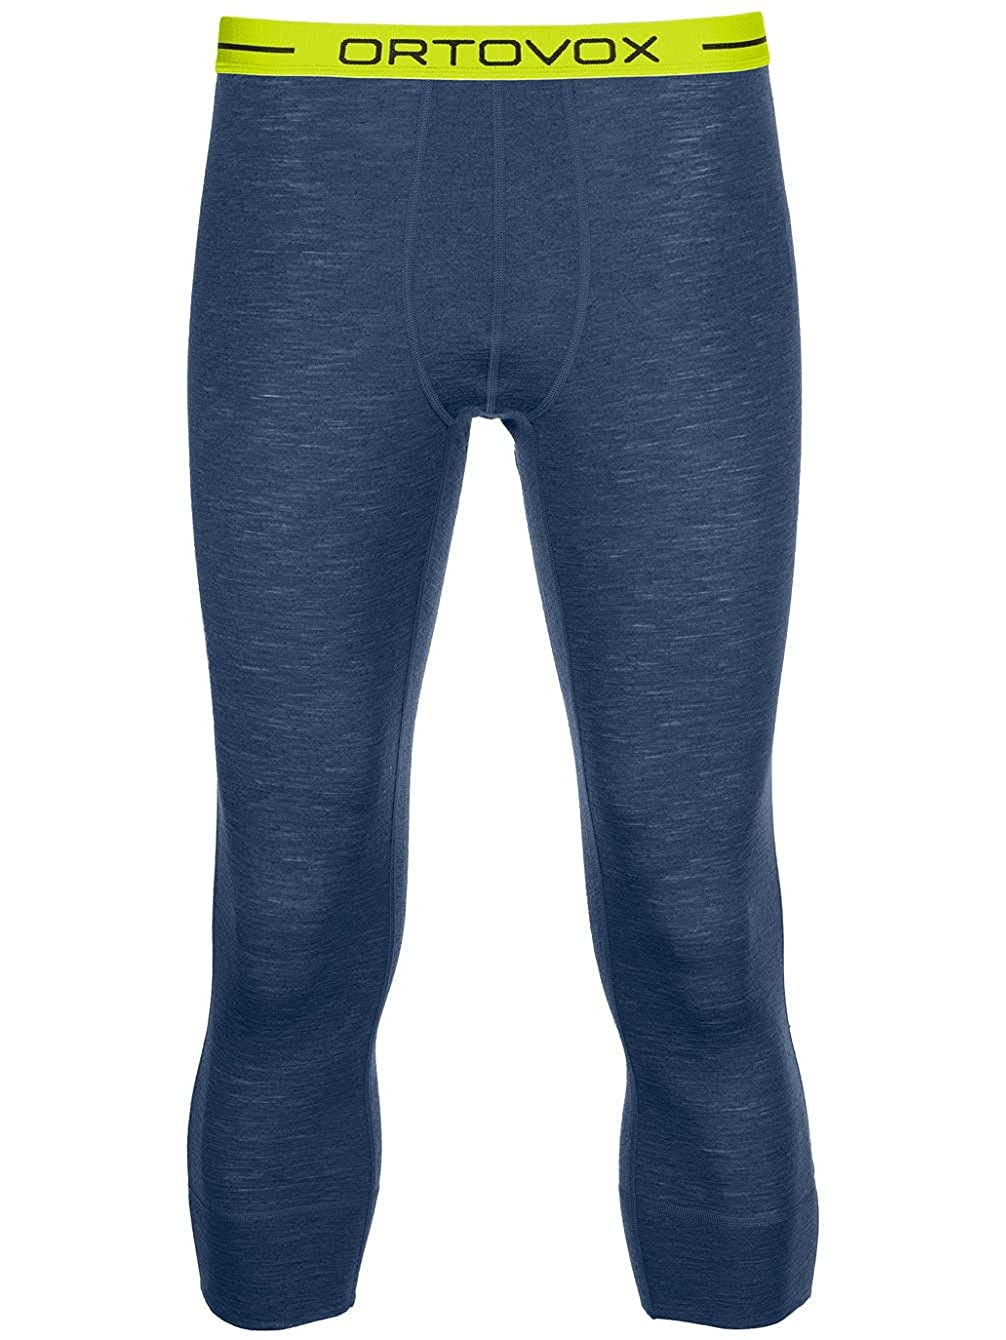 Herren Ortovox Merino 105/Ultra Short Pants M Thermo Hose